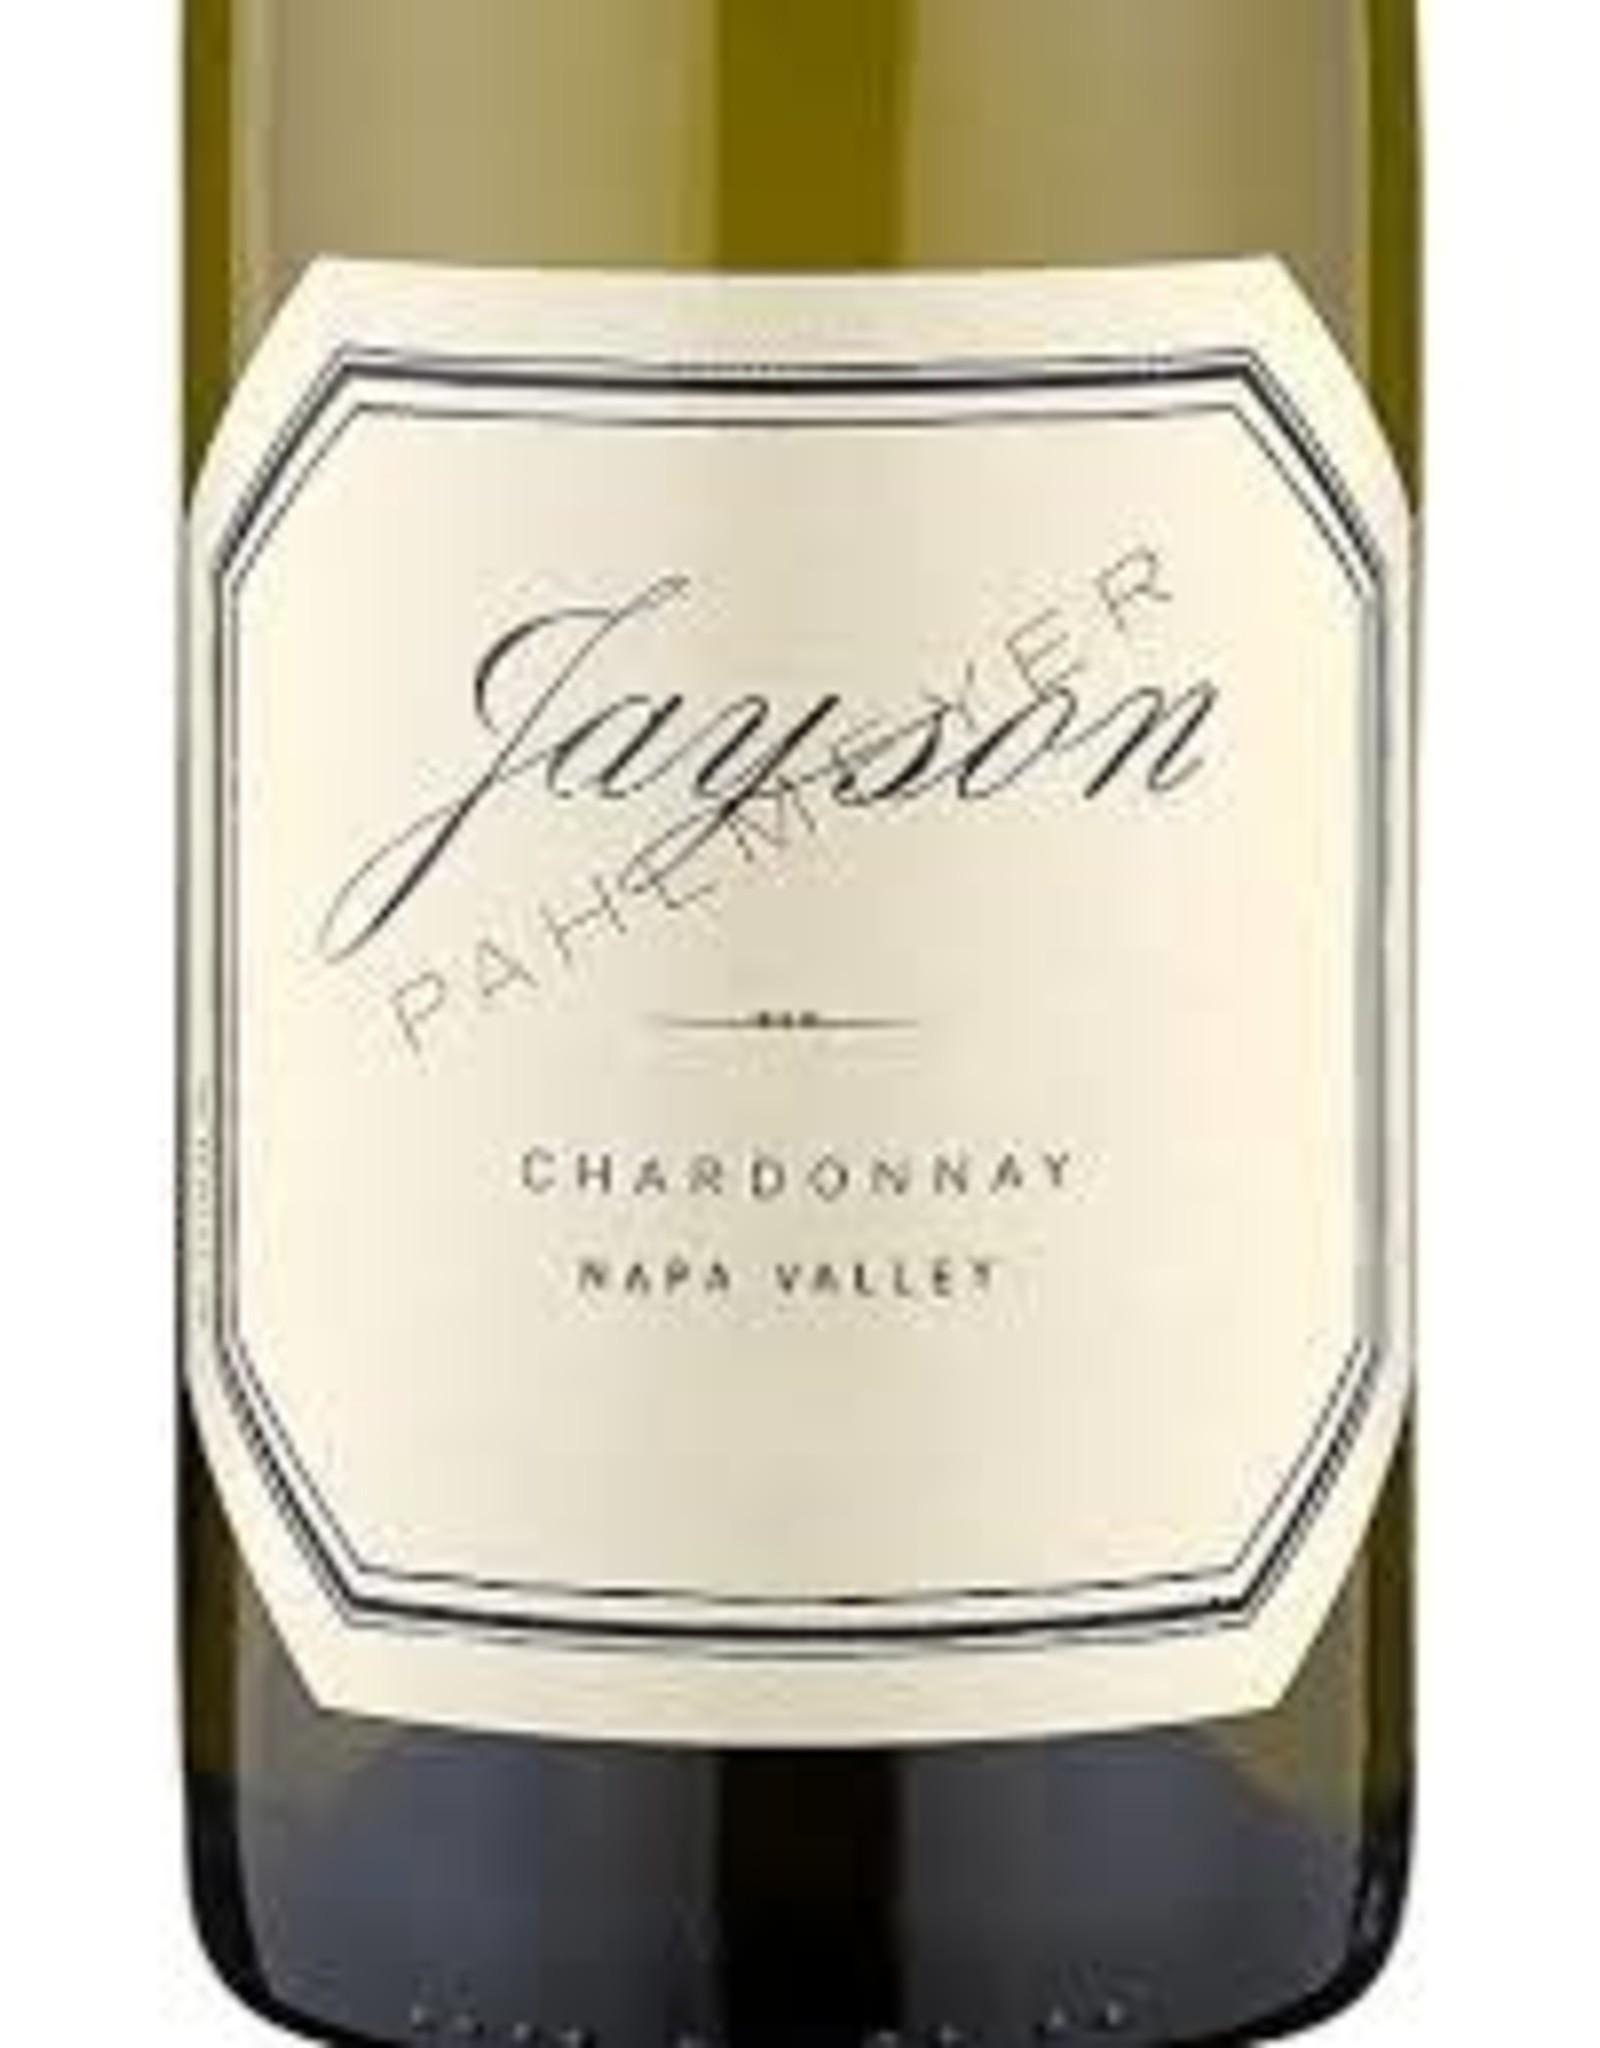 JAYSON CHARDONNAY 2017